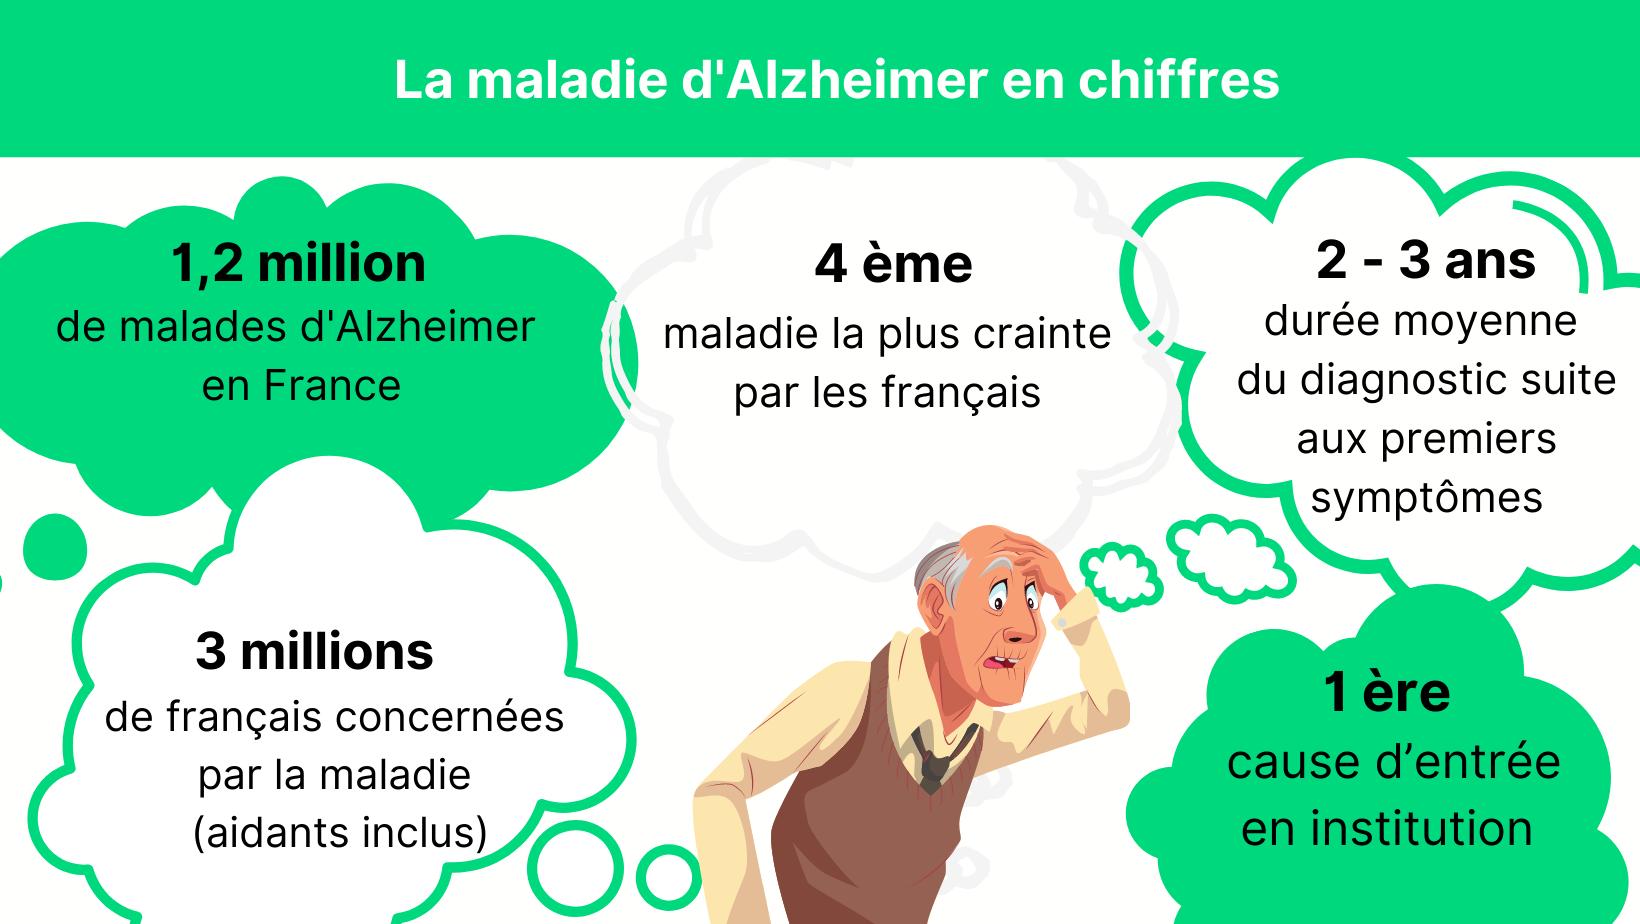 L'Alzheimer en chiffres